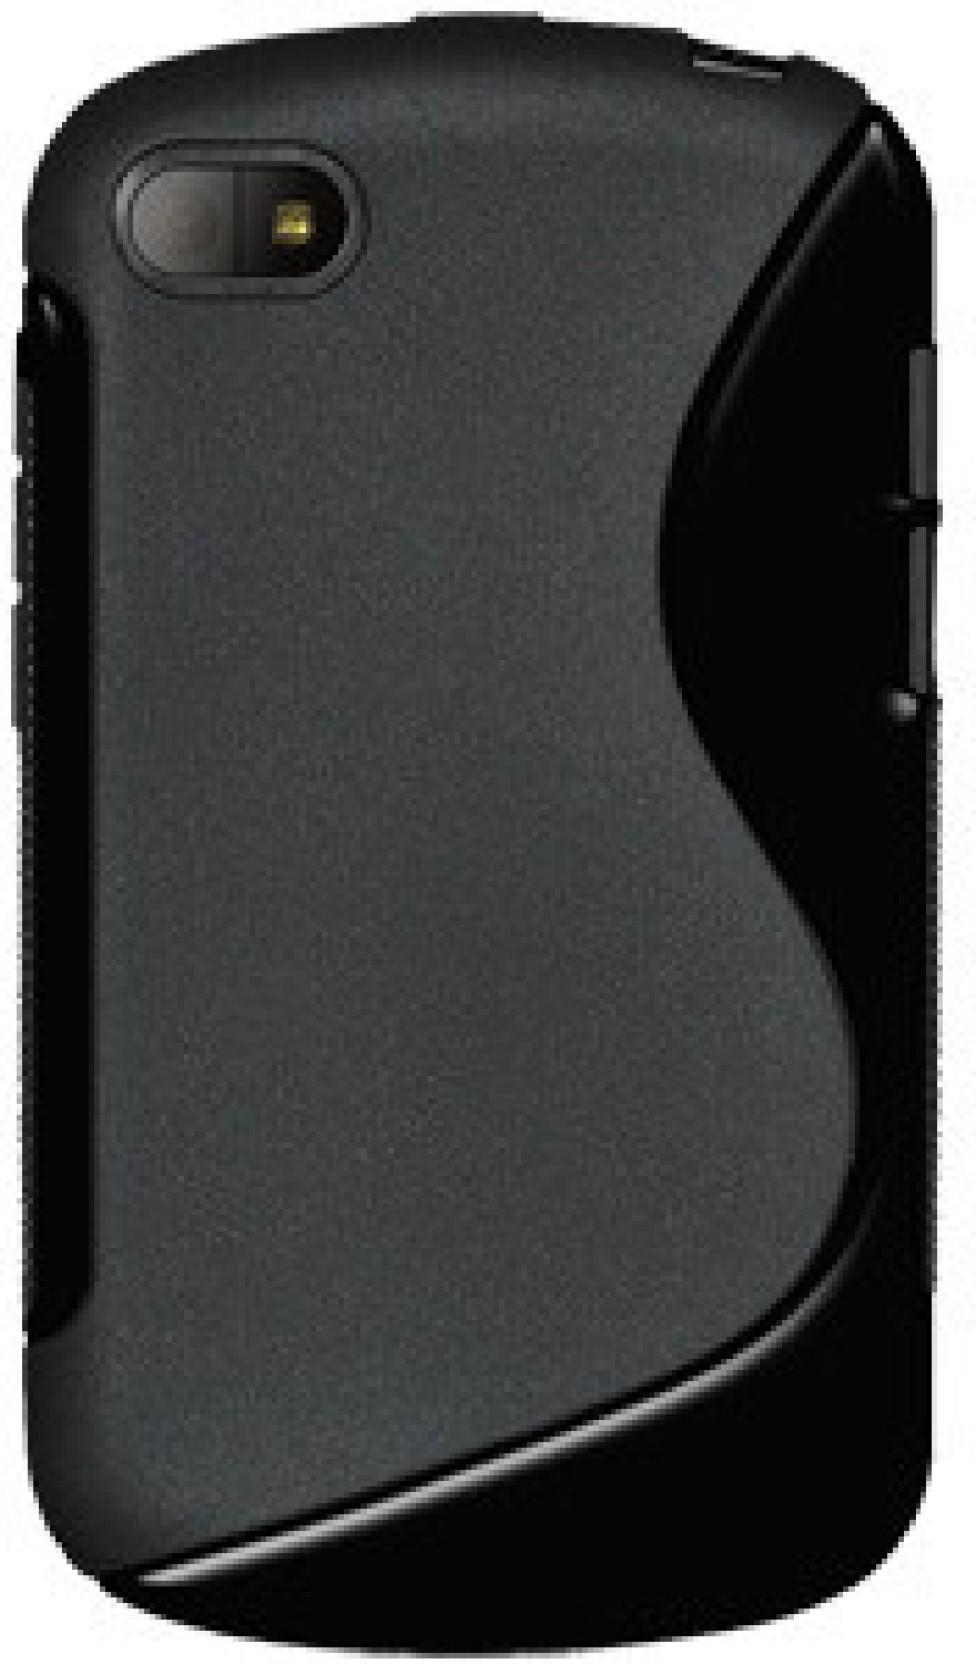 Amzer Back Cover For Blackberry Q10 Black Home